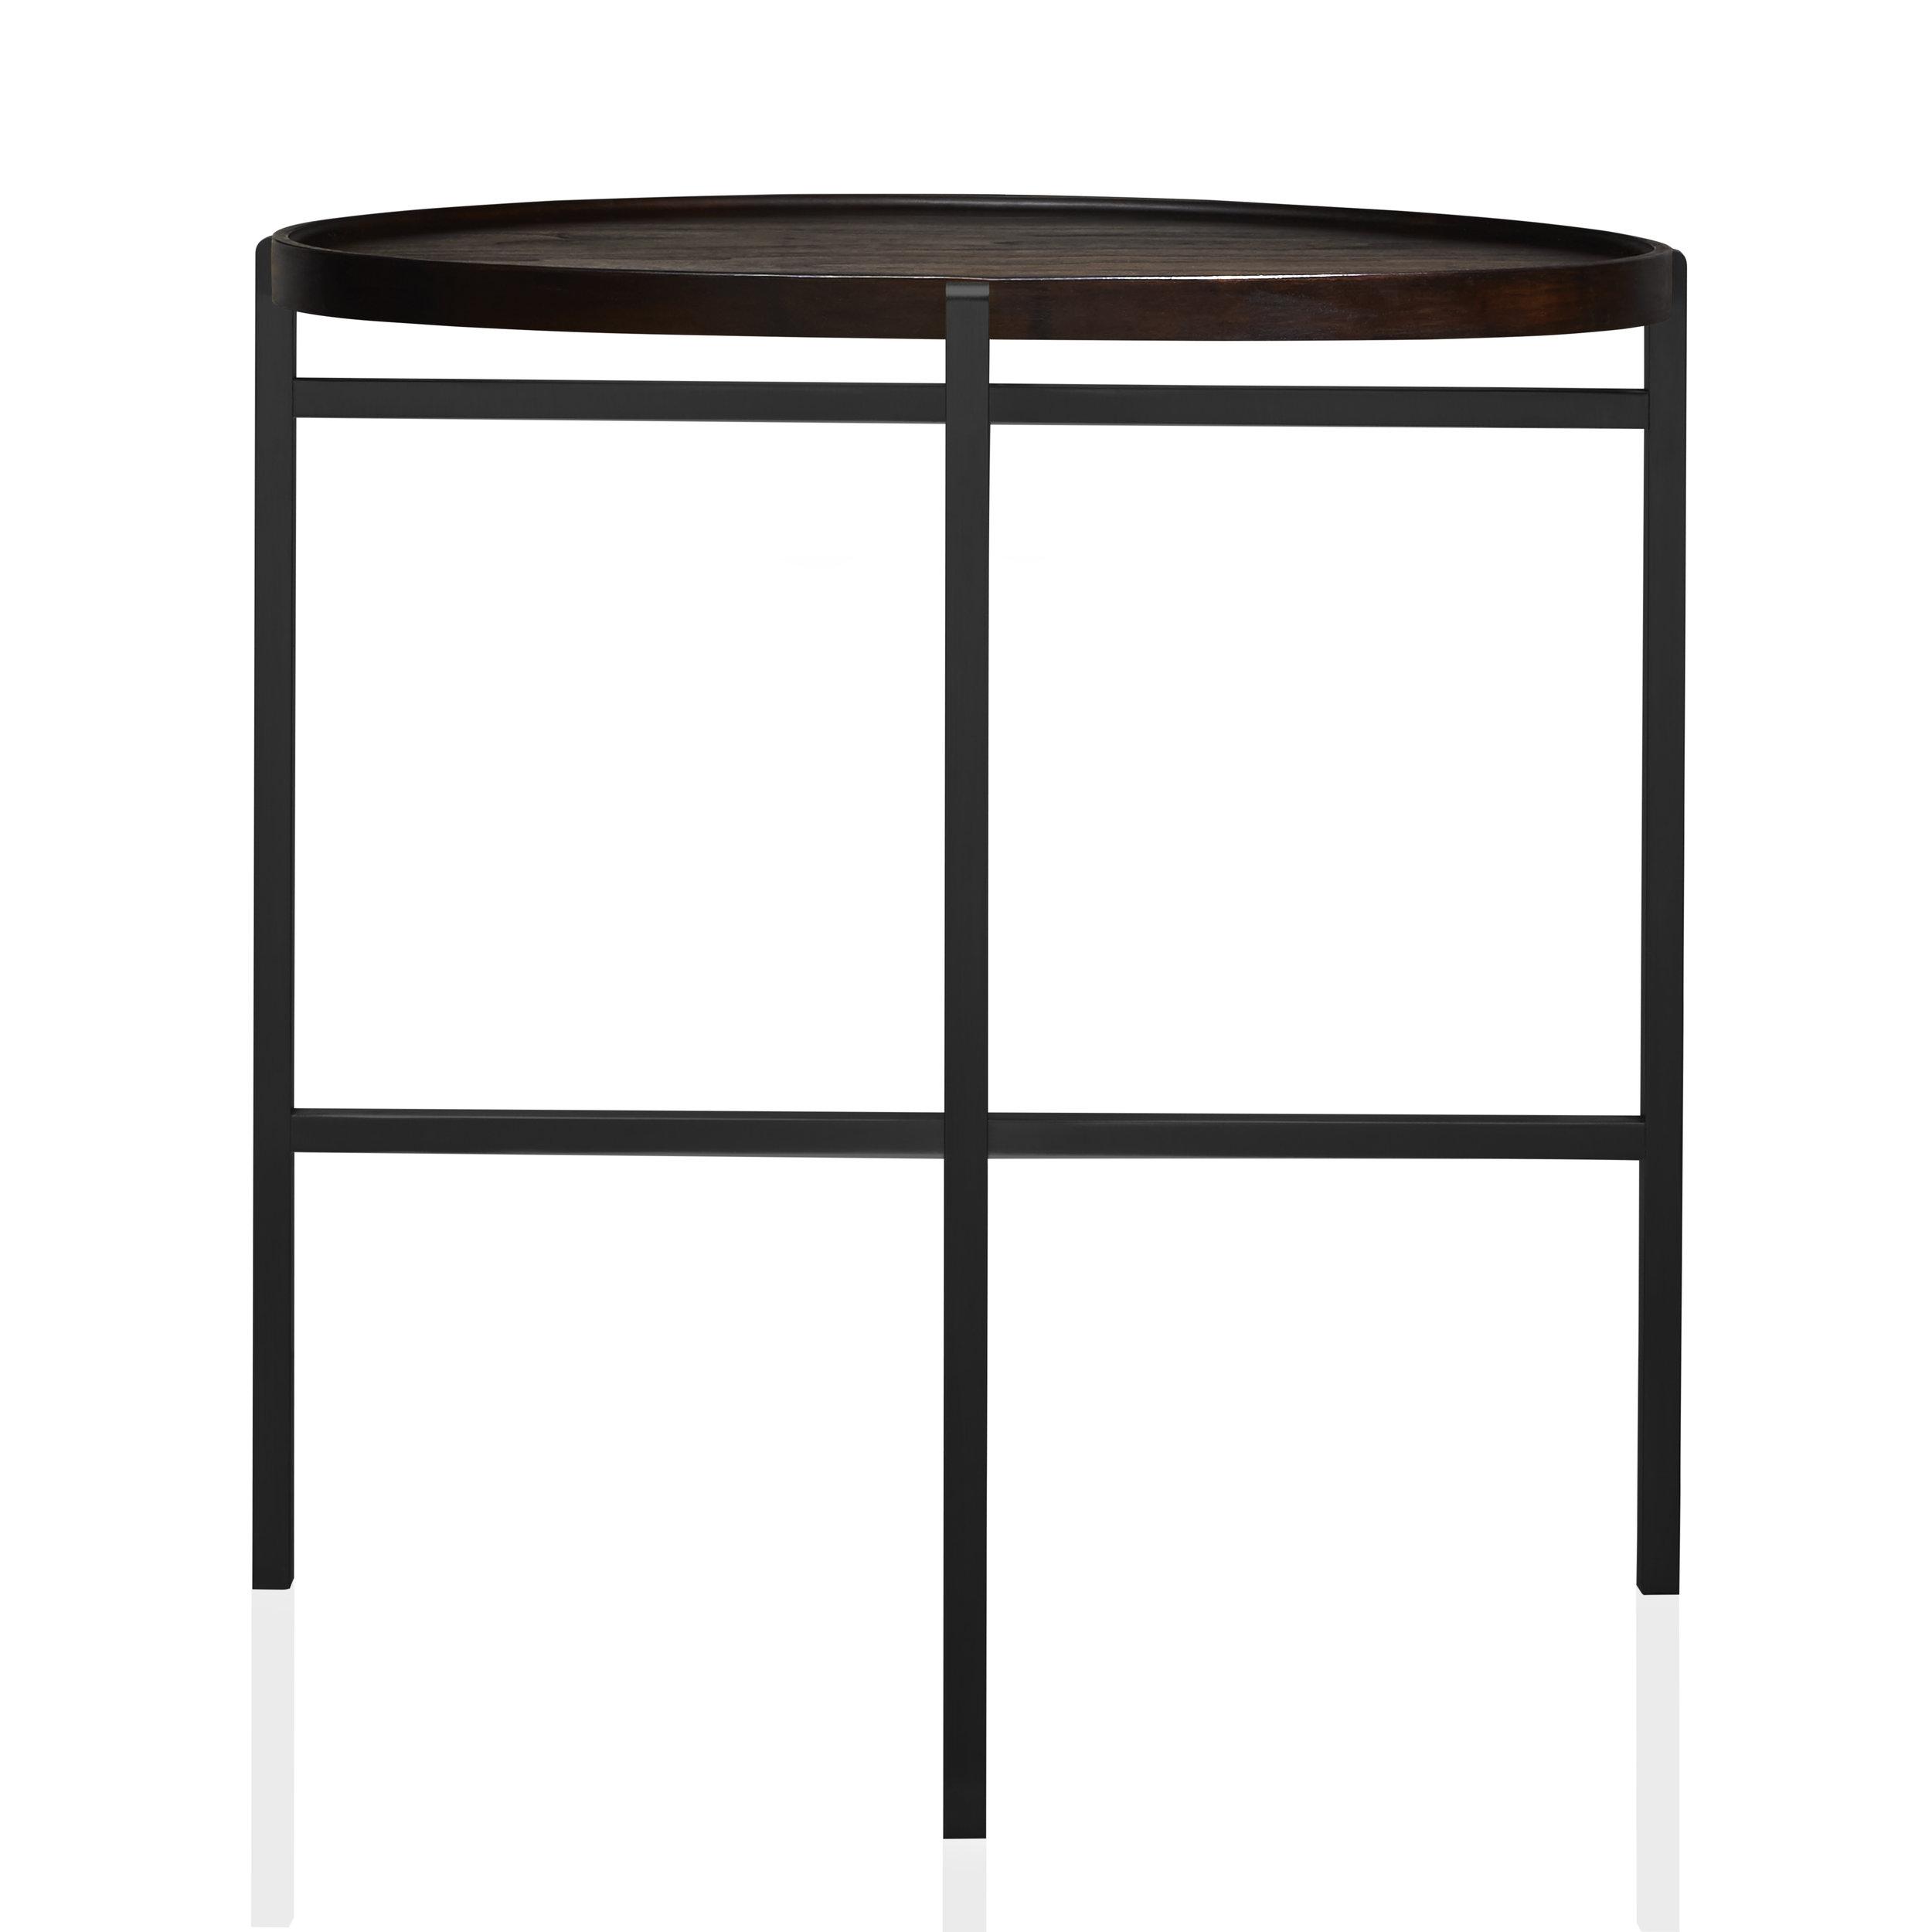 Table_BL_Black-Wood_2.jpg